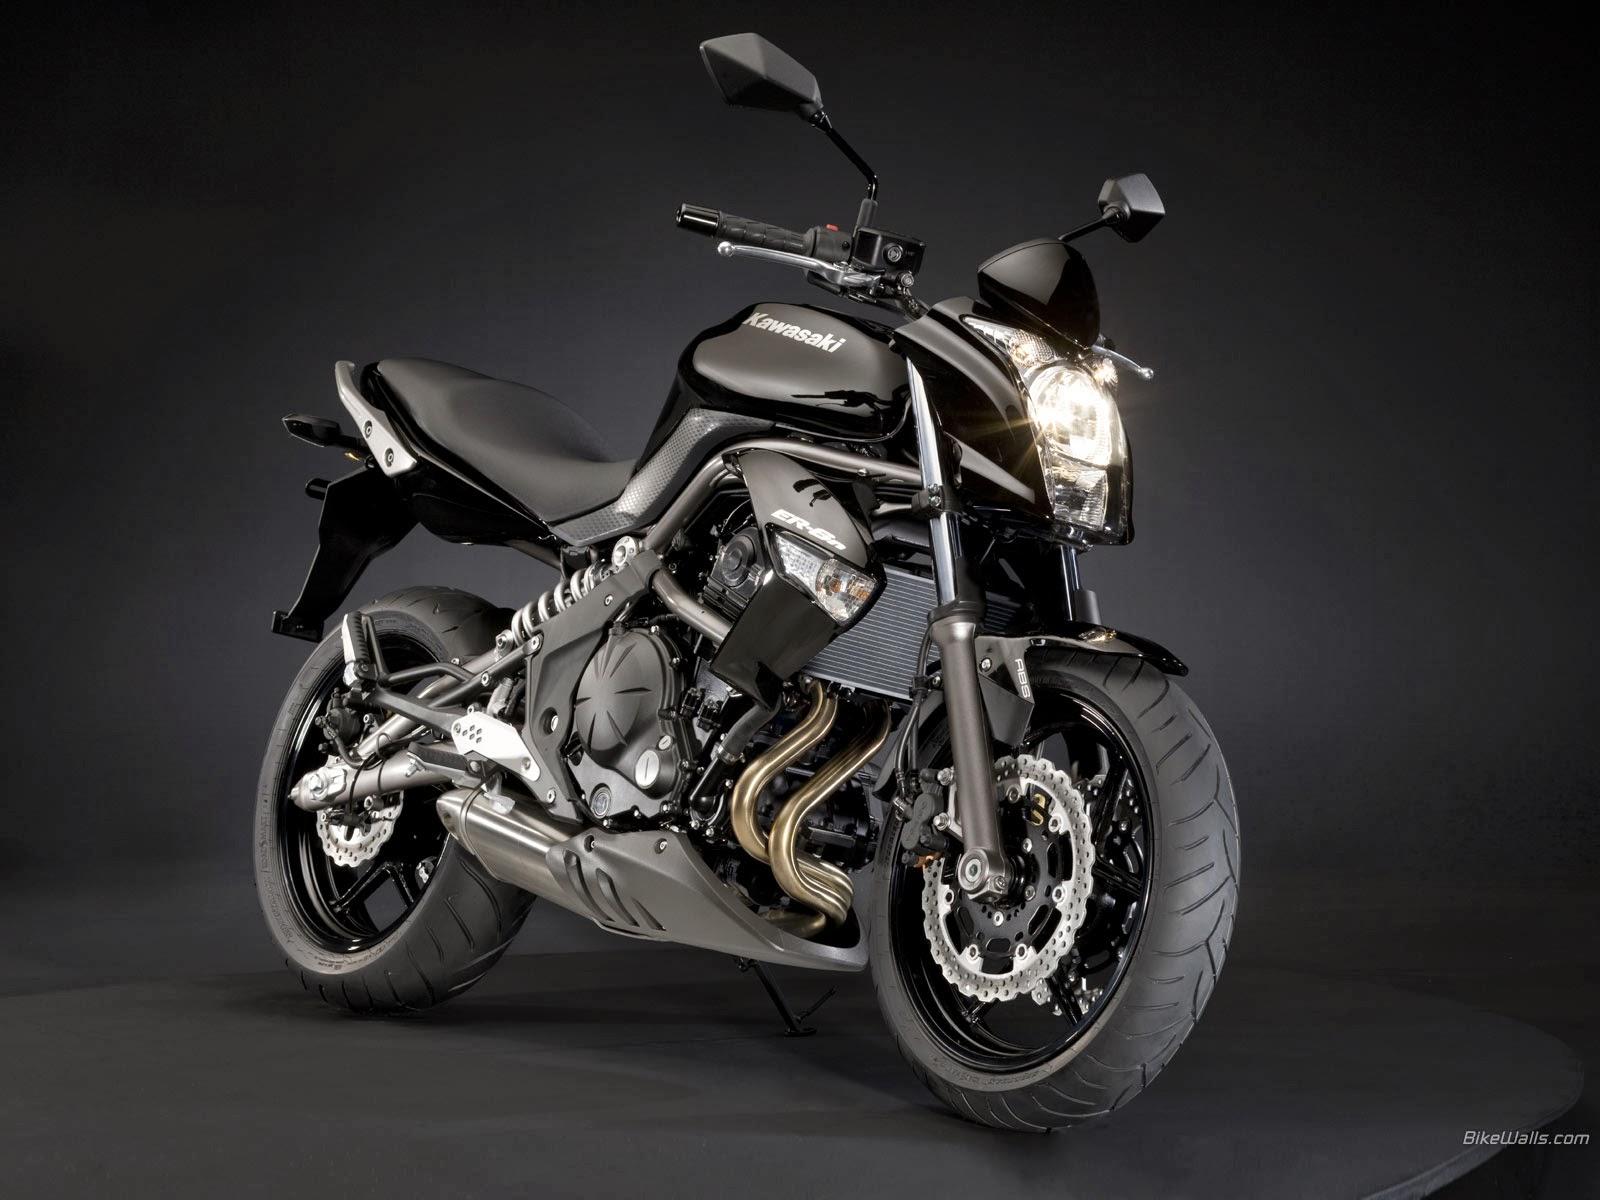 Kawasaki er 6n 2 kawasaki motor kawasaki er 6n arazi motorlar motor fotoraflar motor modelleri altavistaventures Choice Image